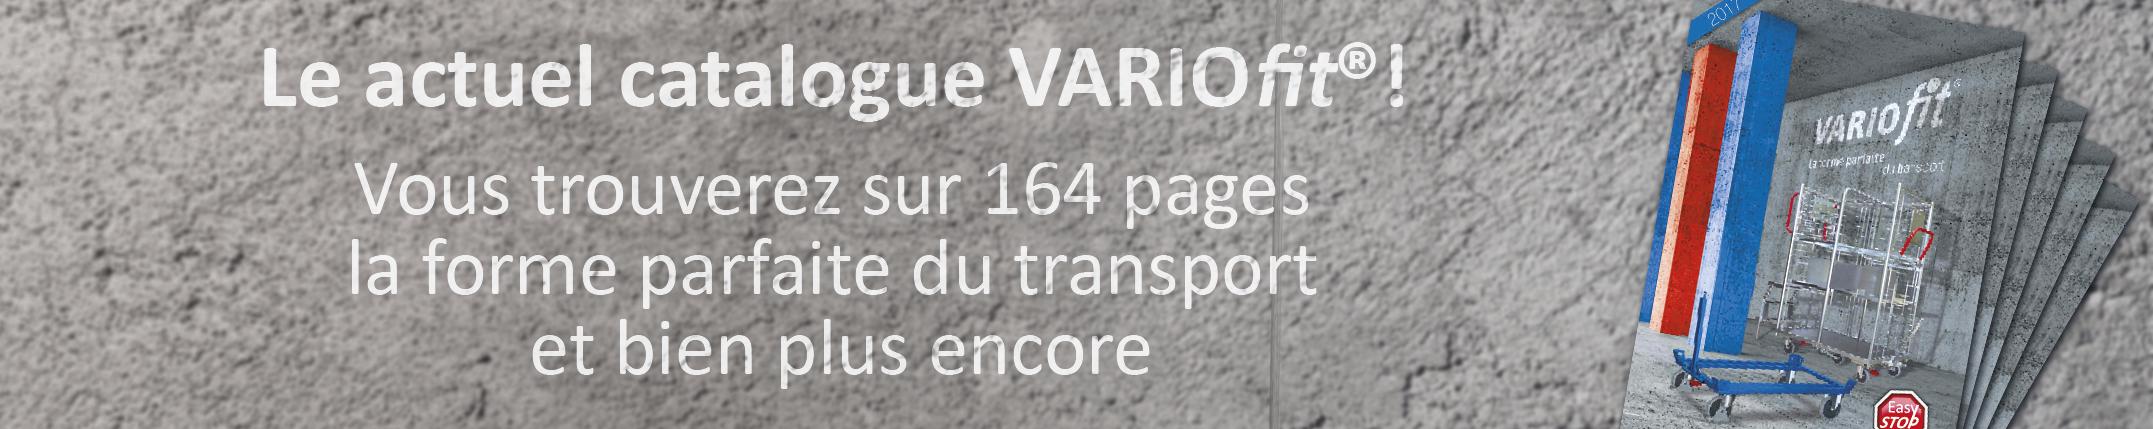 der-aktuelle-Katalog-fr-